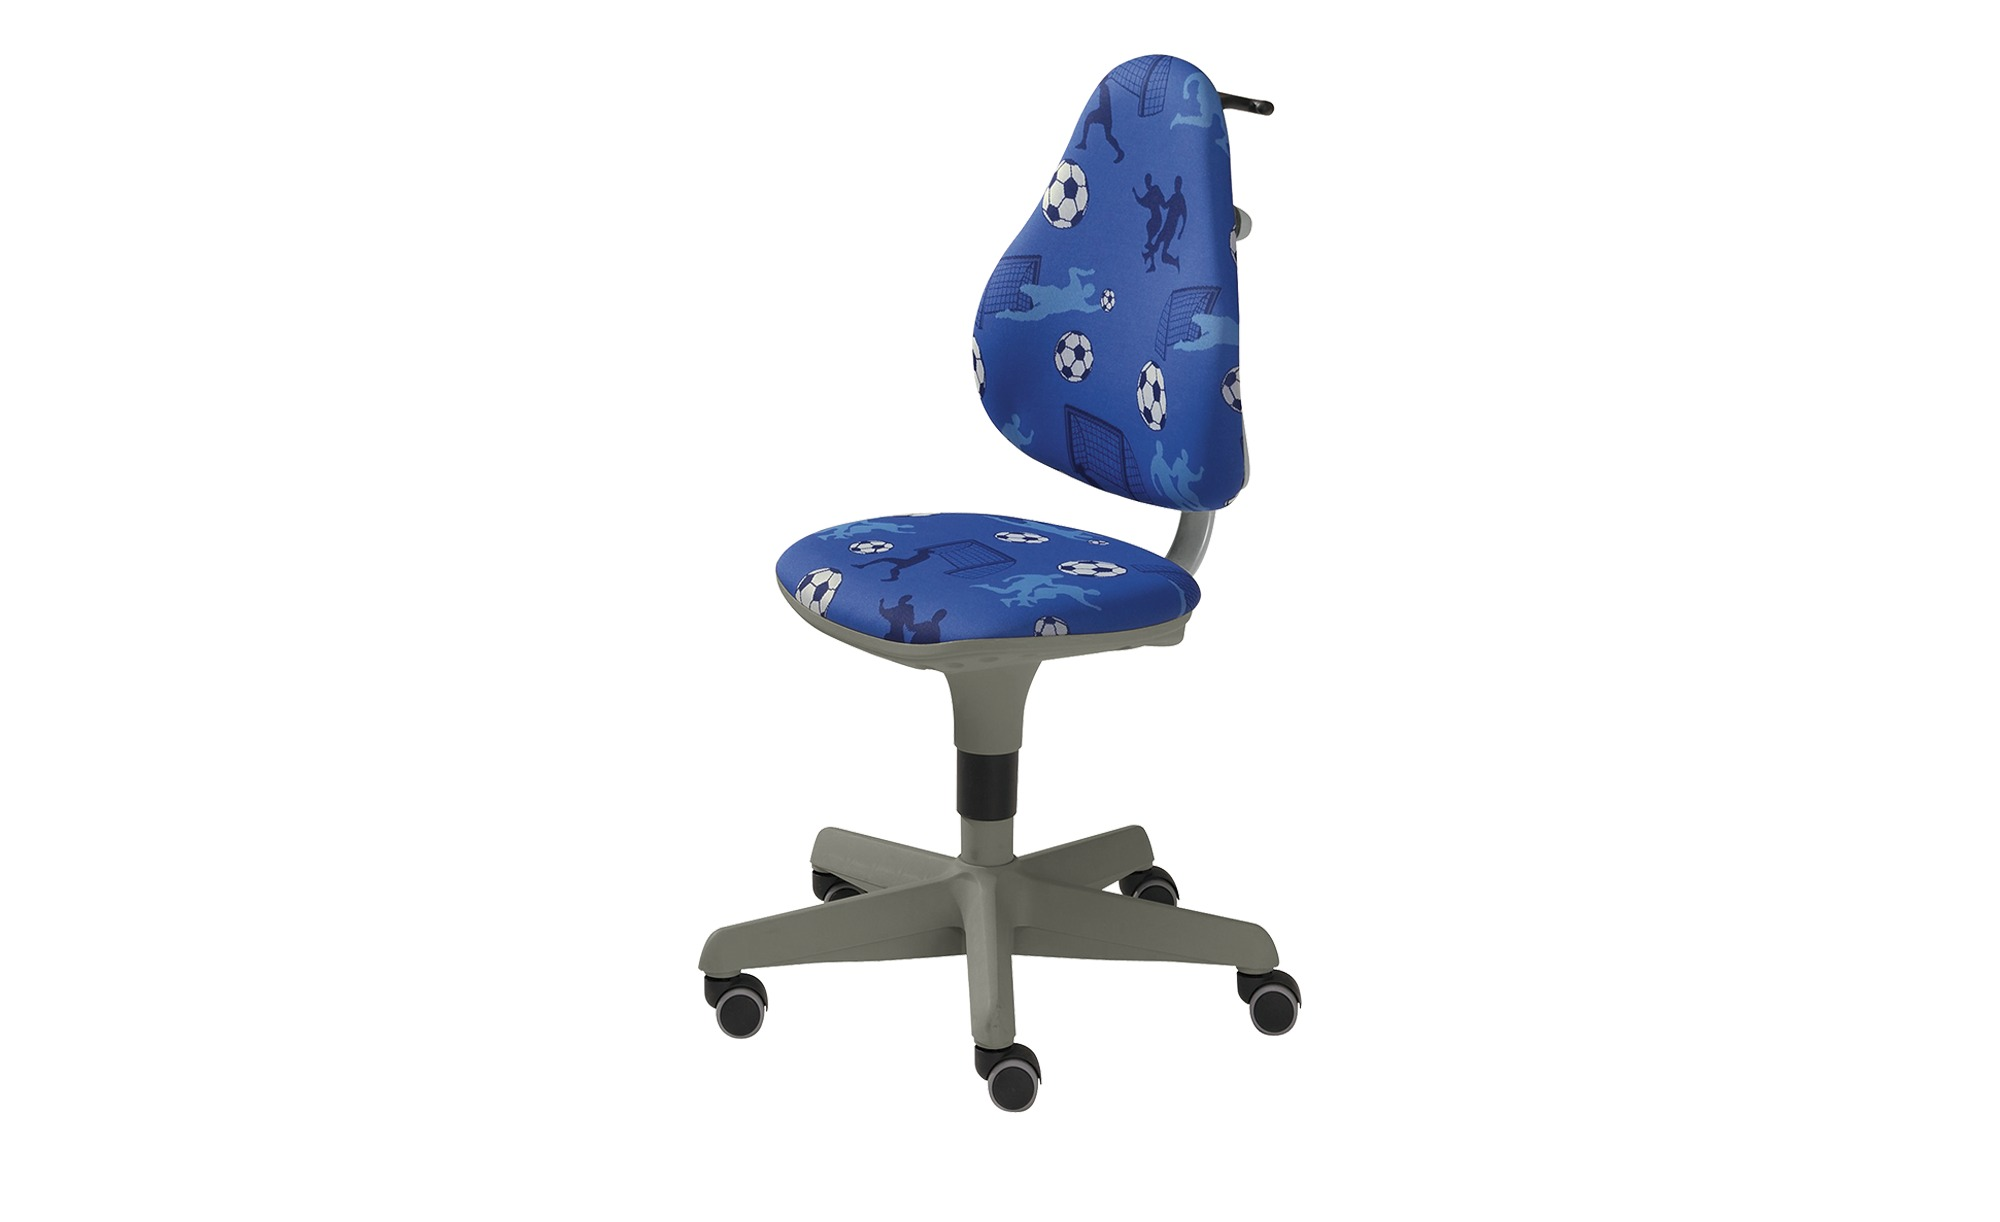 PAIDI Kinder-und Jugenddrehstuhl  Pepe ¦ blau Stühle > Bürostühle > Drehstühle - Höffner | Kinderzimmer > Kinderzimmerstühle > Kinderstühle | Blau | Möbel Höffner DE